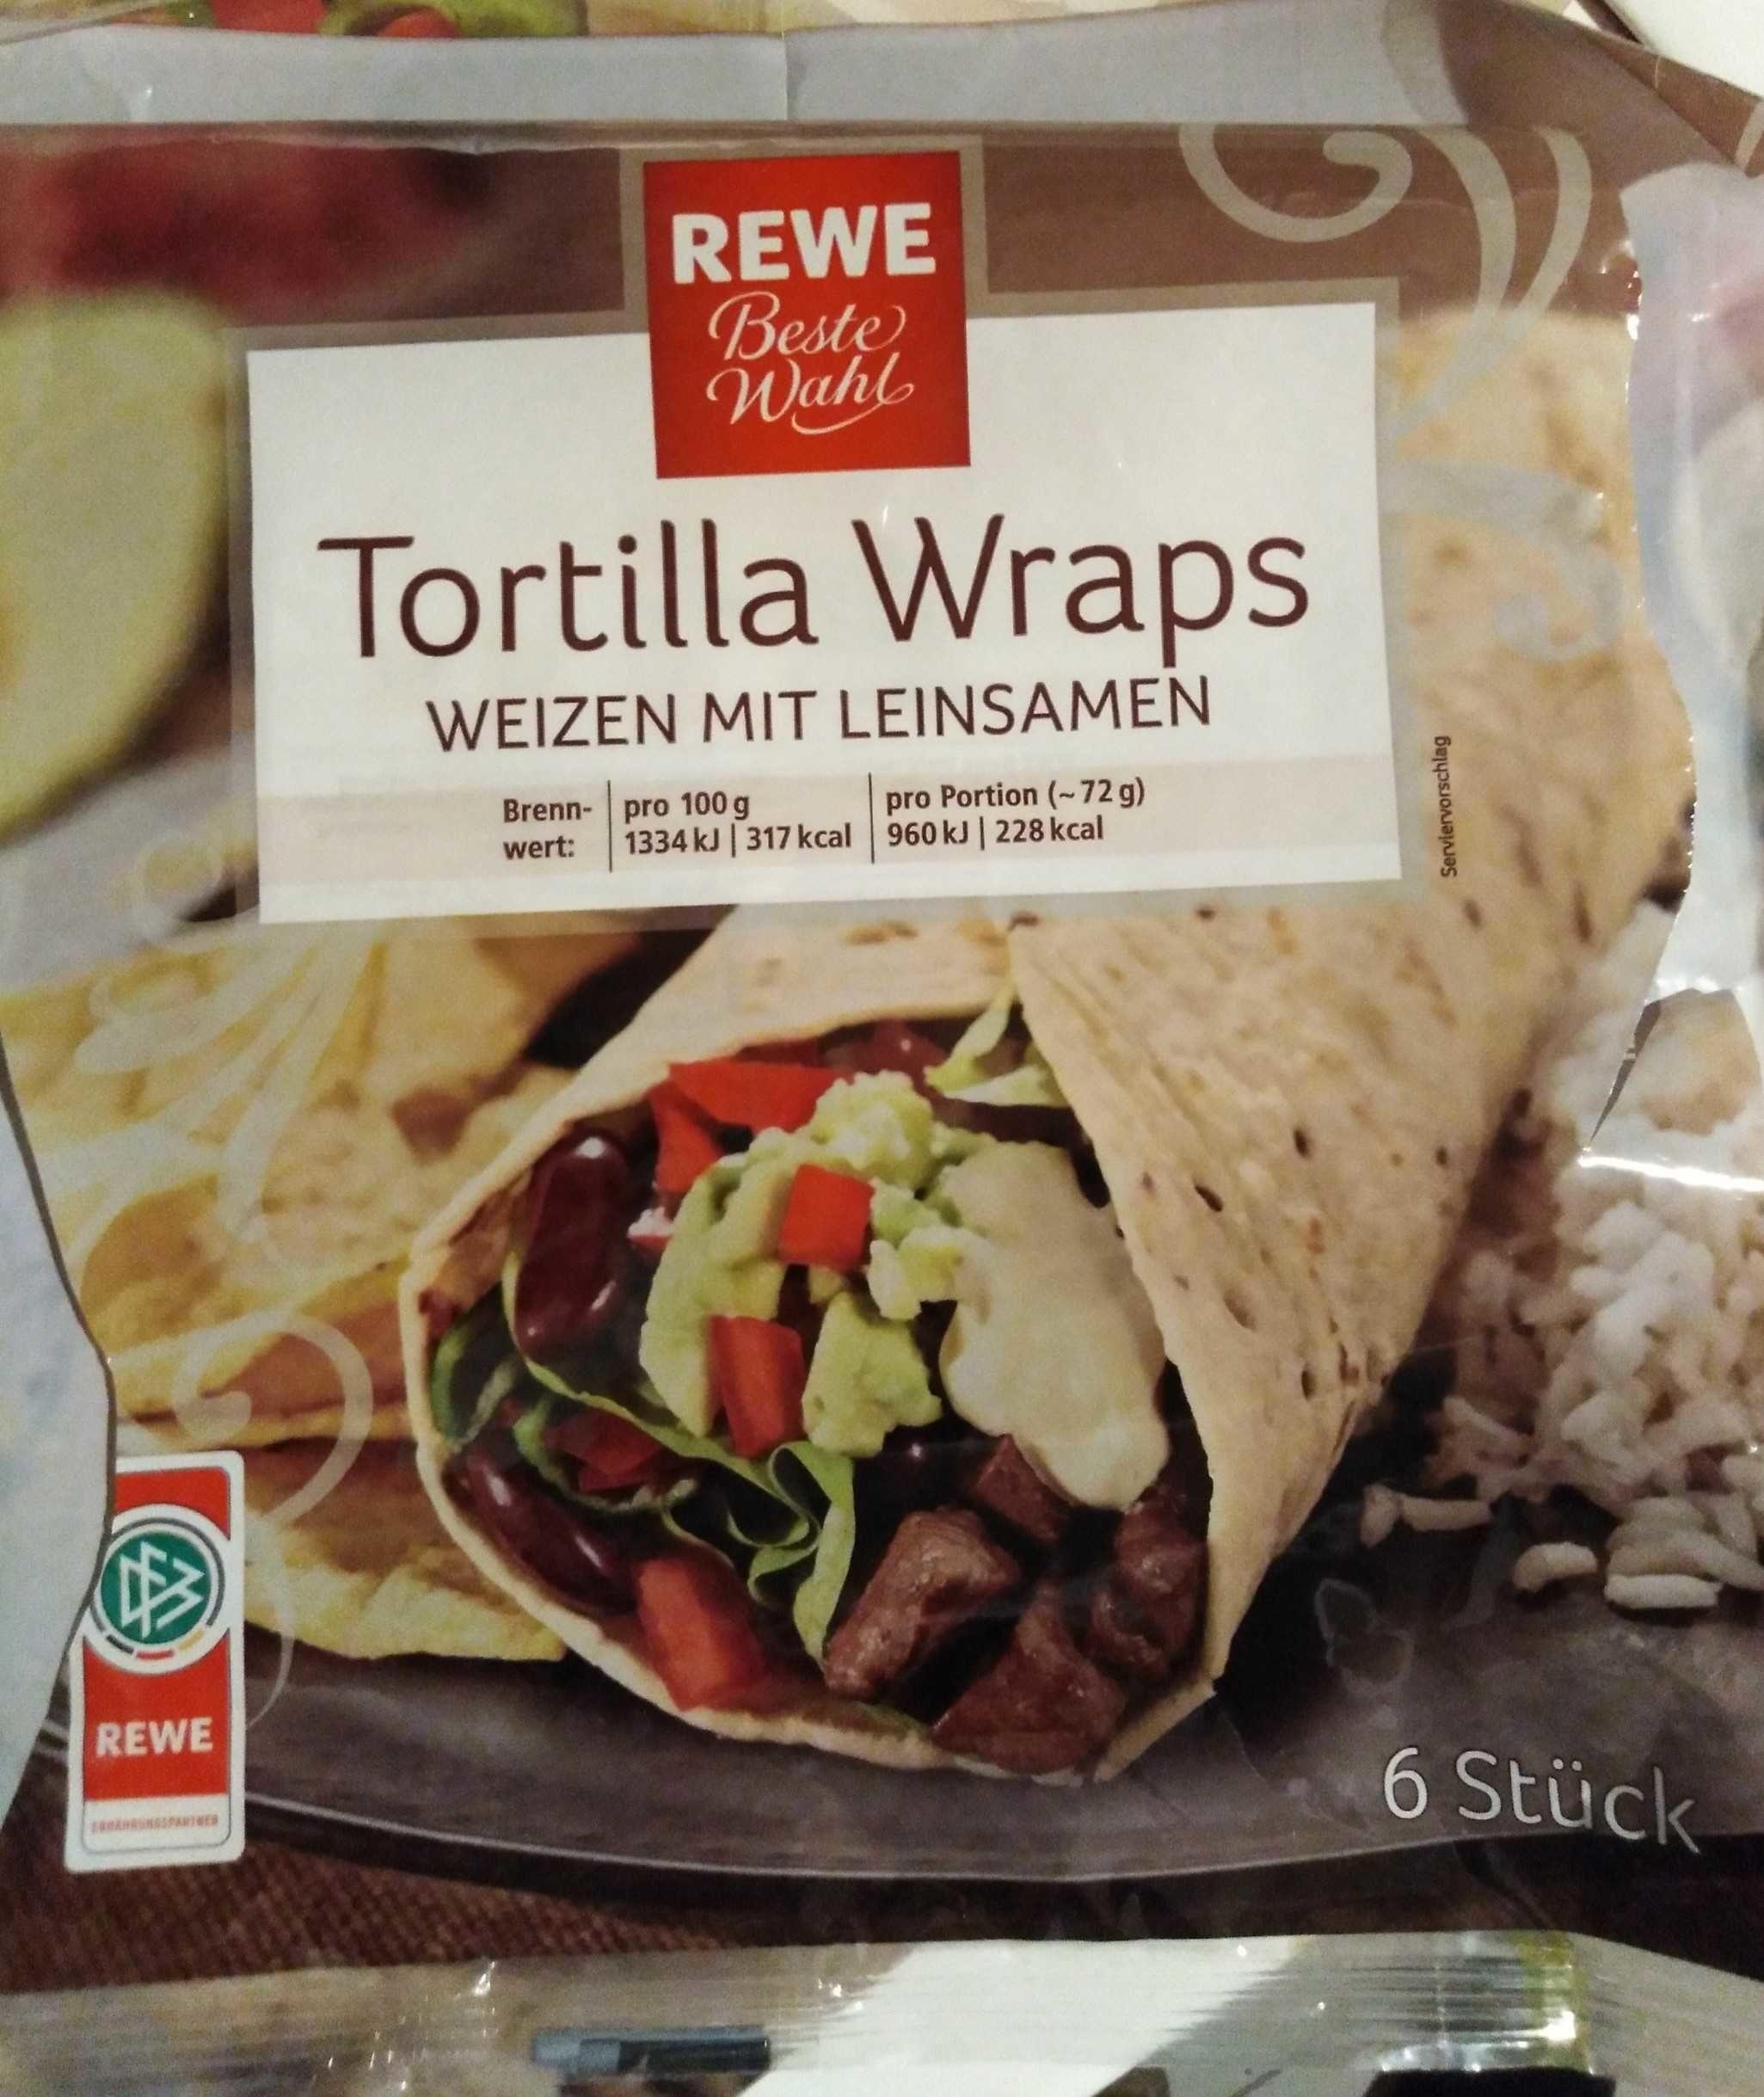 Tortilla Wraps,Mit Leinsamen - Product - en